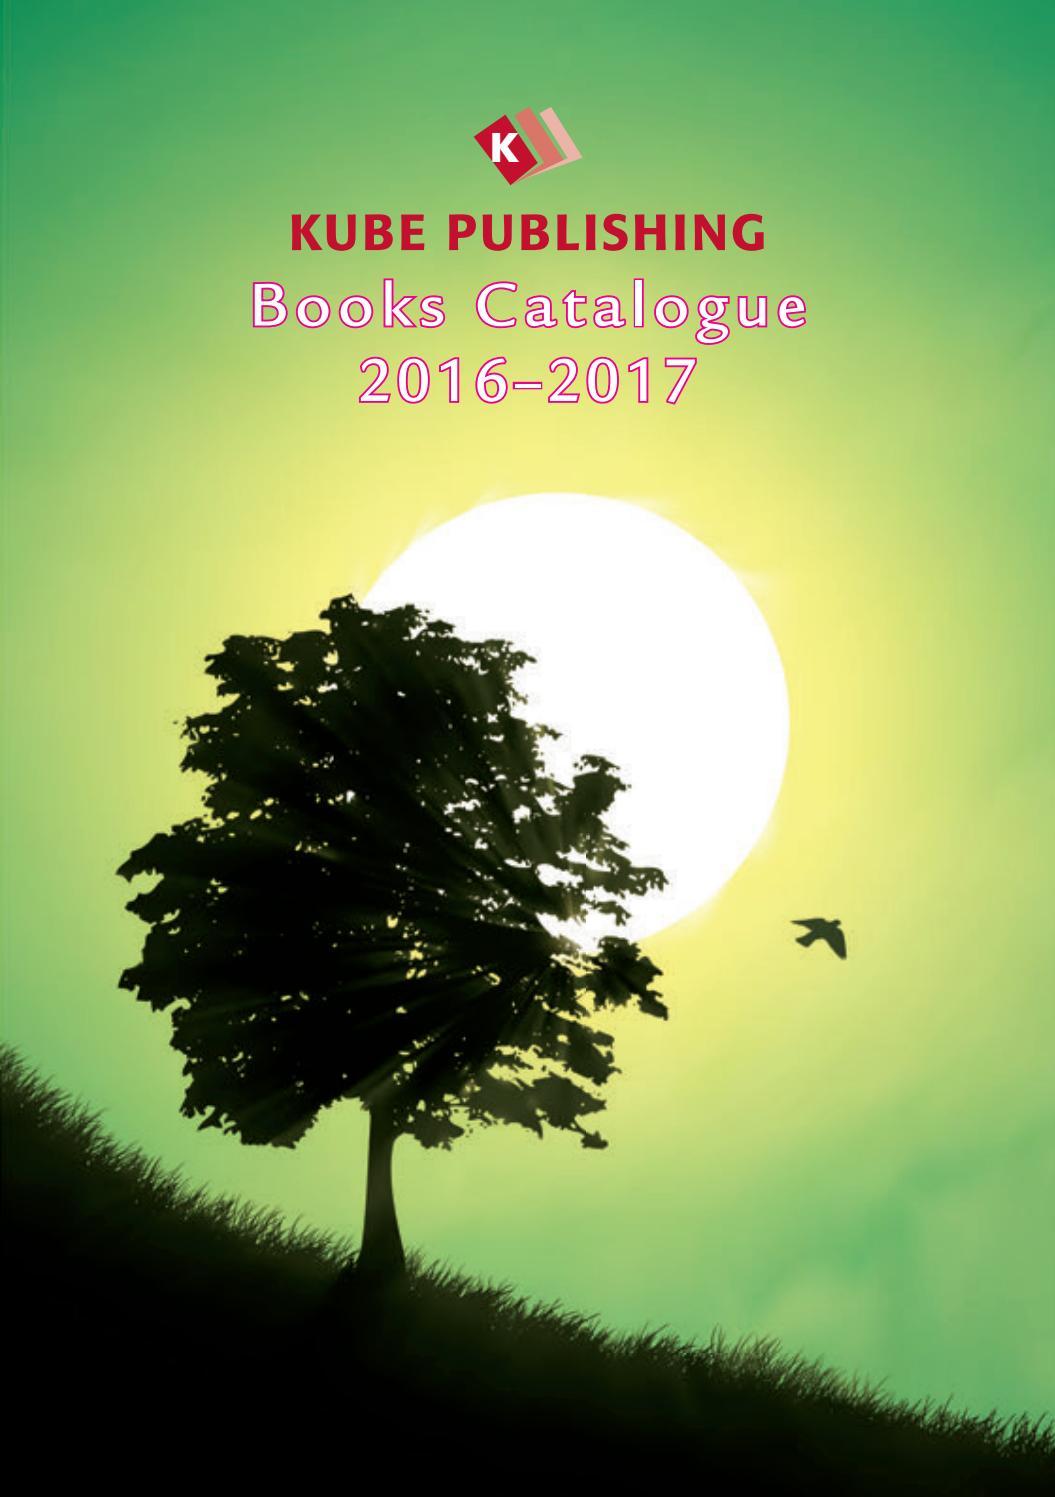 Kube trade catalogue 2017-18 by Kube Publishing - issuu